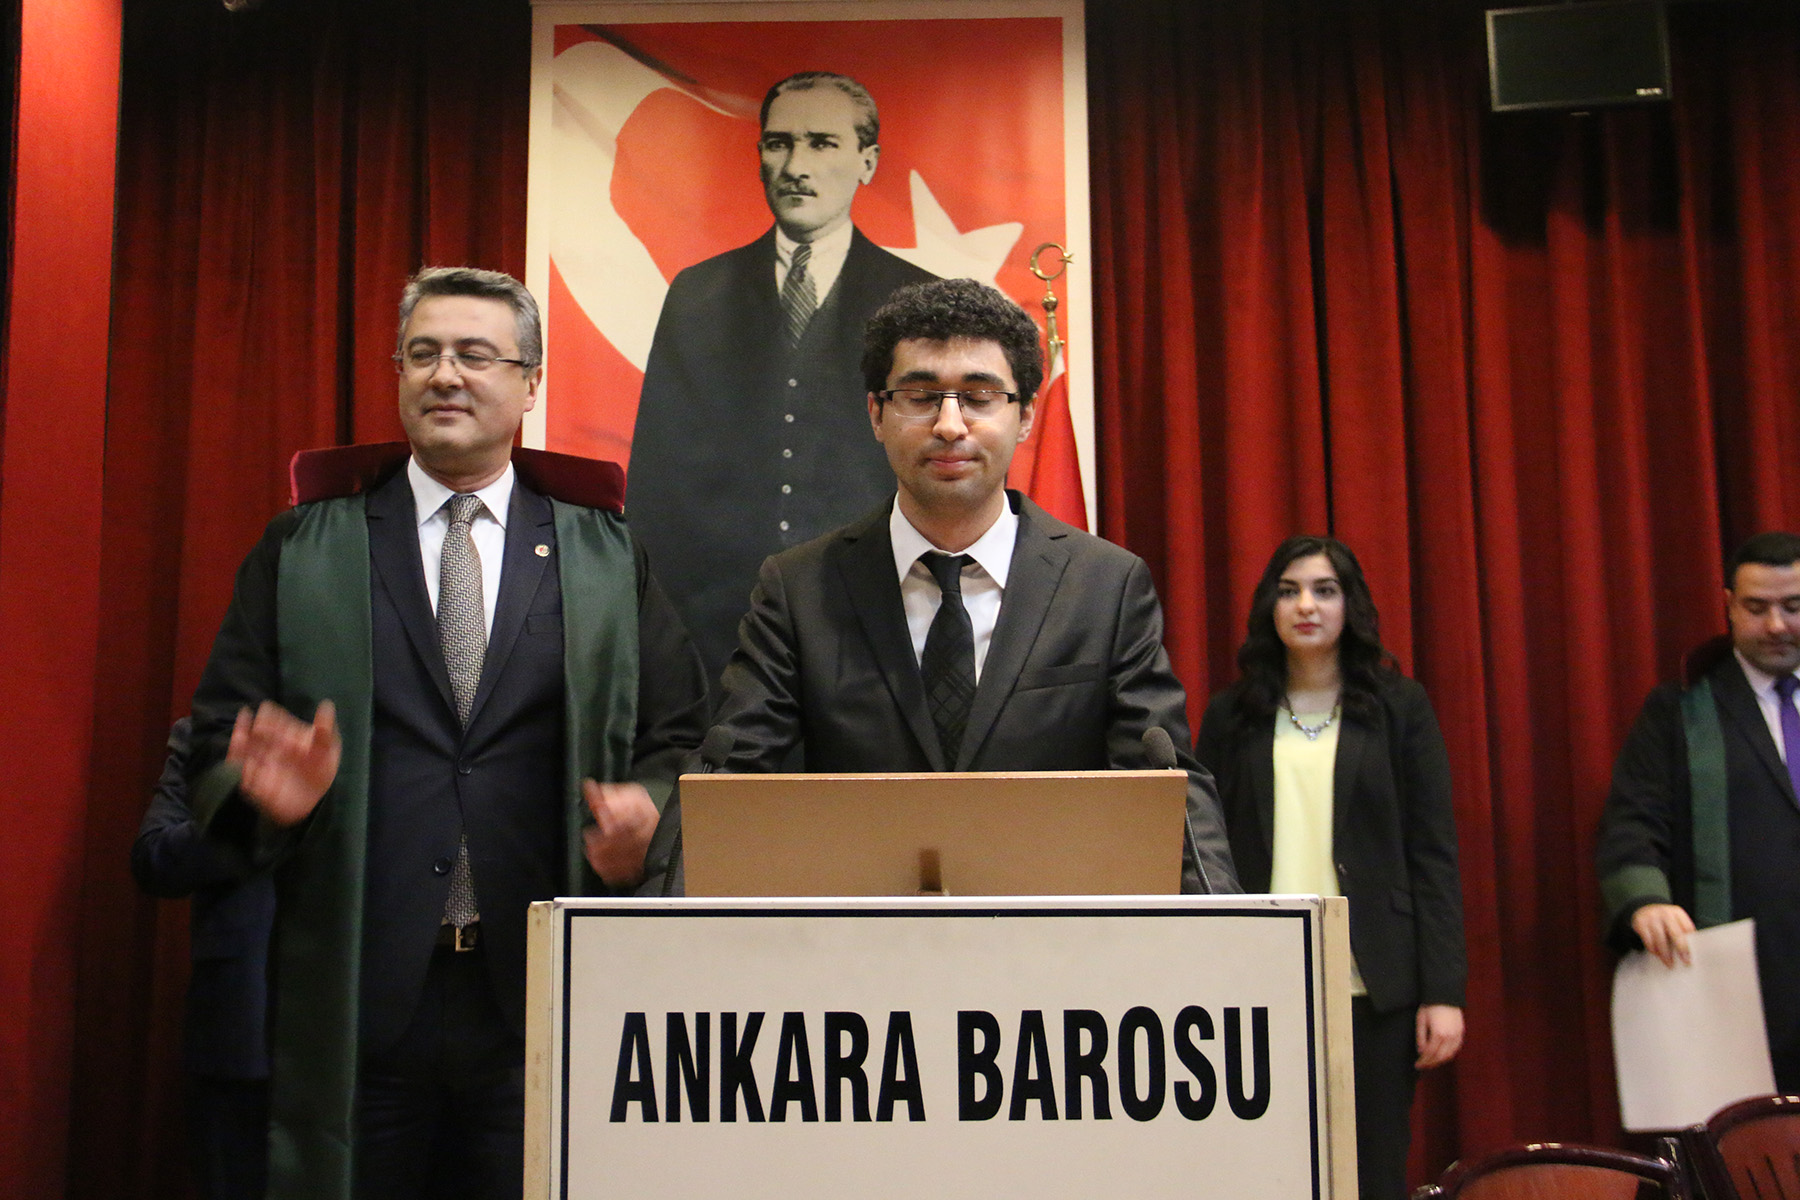 essay ekin deniz ilhan Deni̇z f & m turkish eki̇n f turkish means harvest, culture in turkish ekrem m turkish turkish form of akram i̇lhan m turkish.